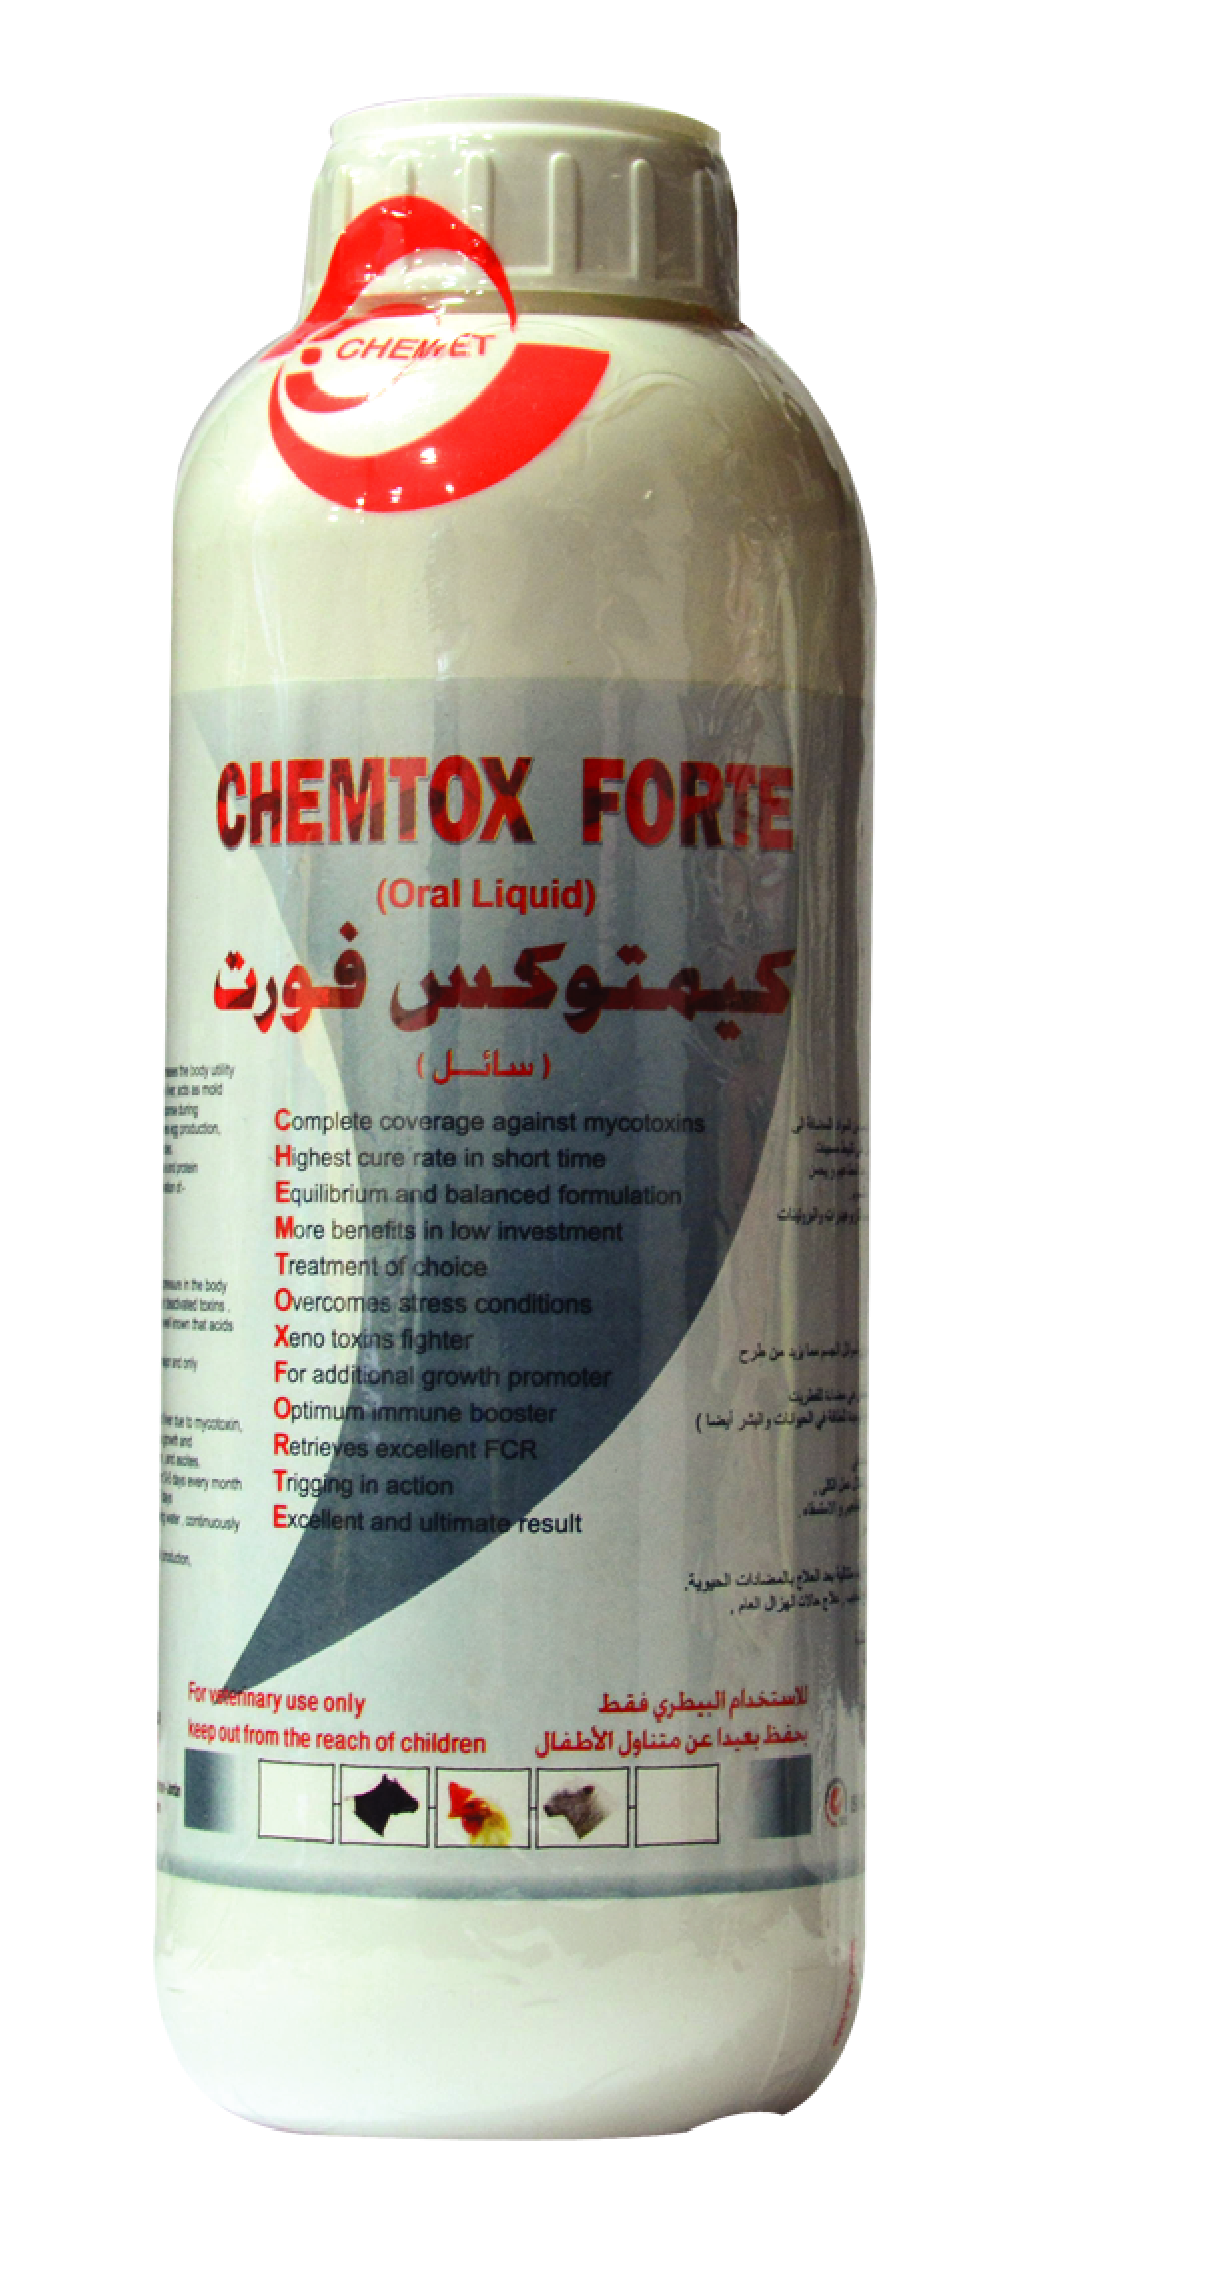 Chemtox forte